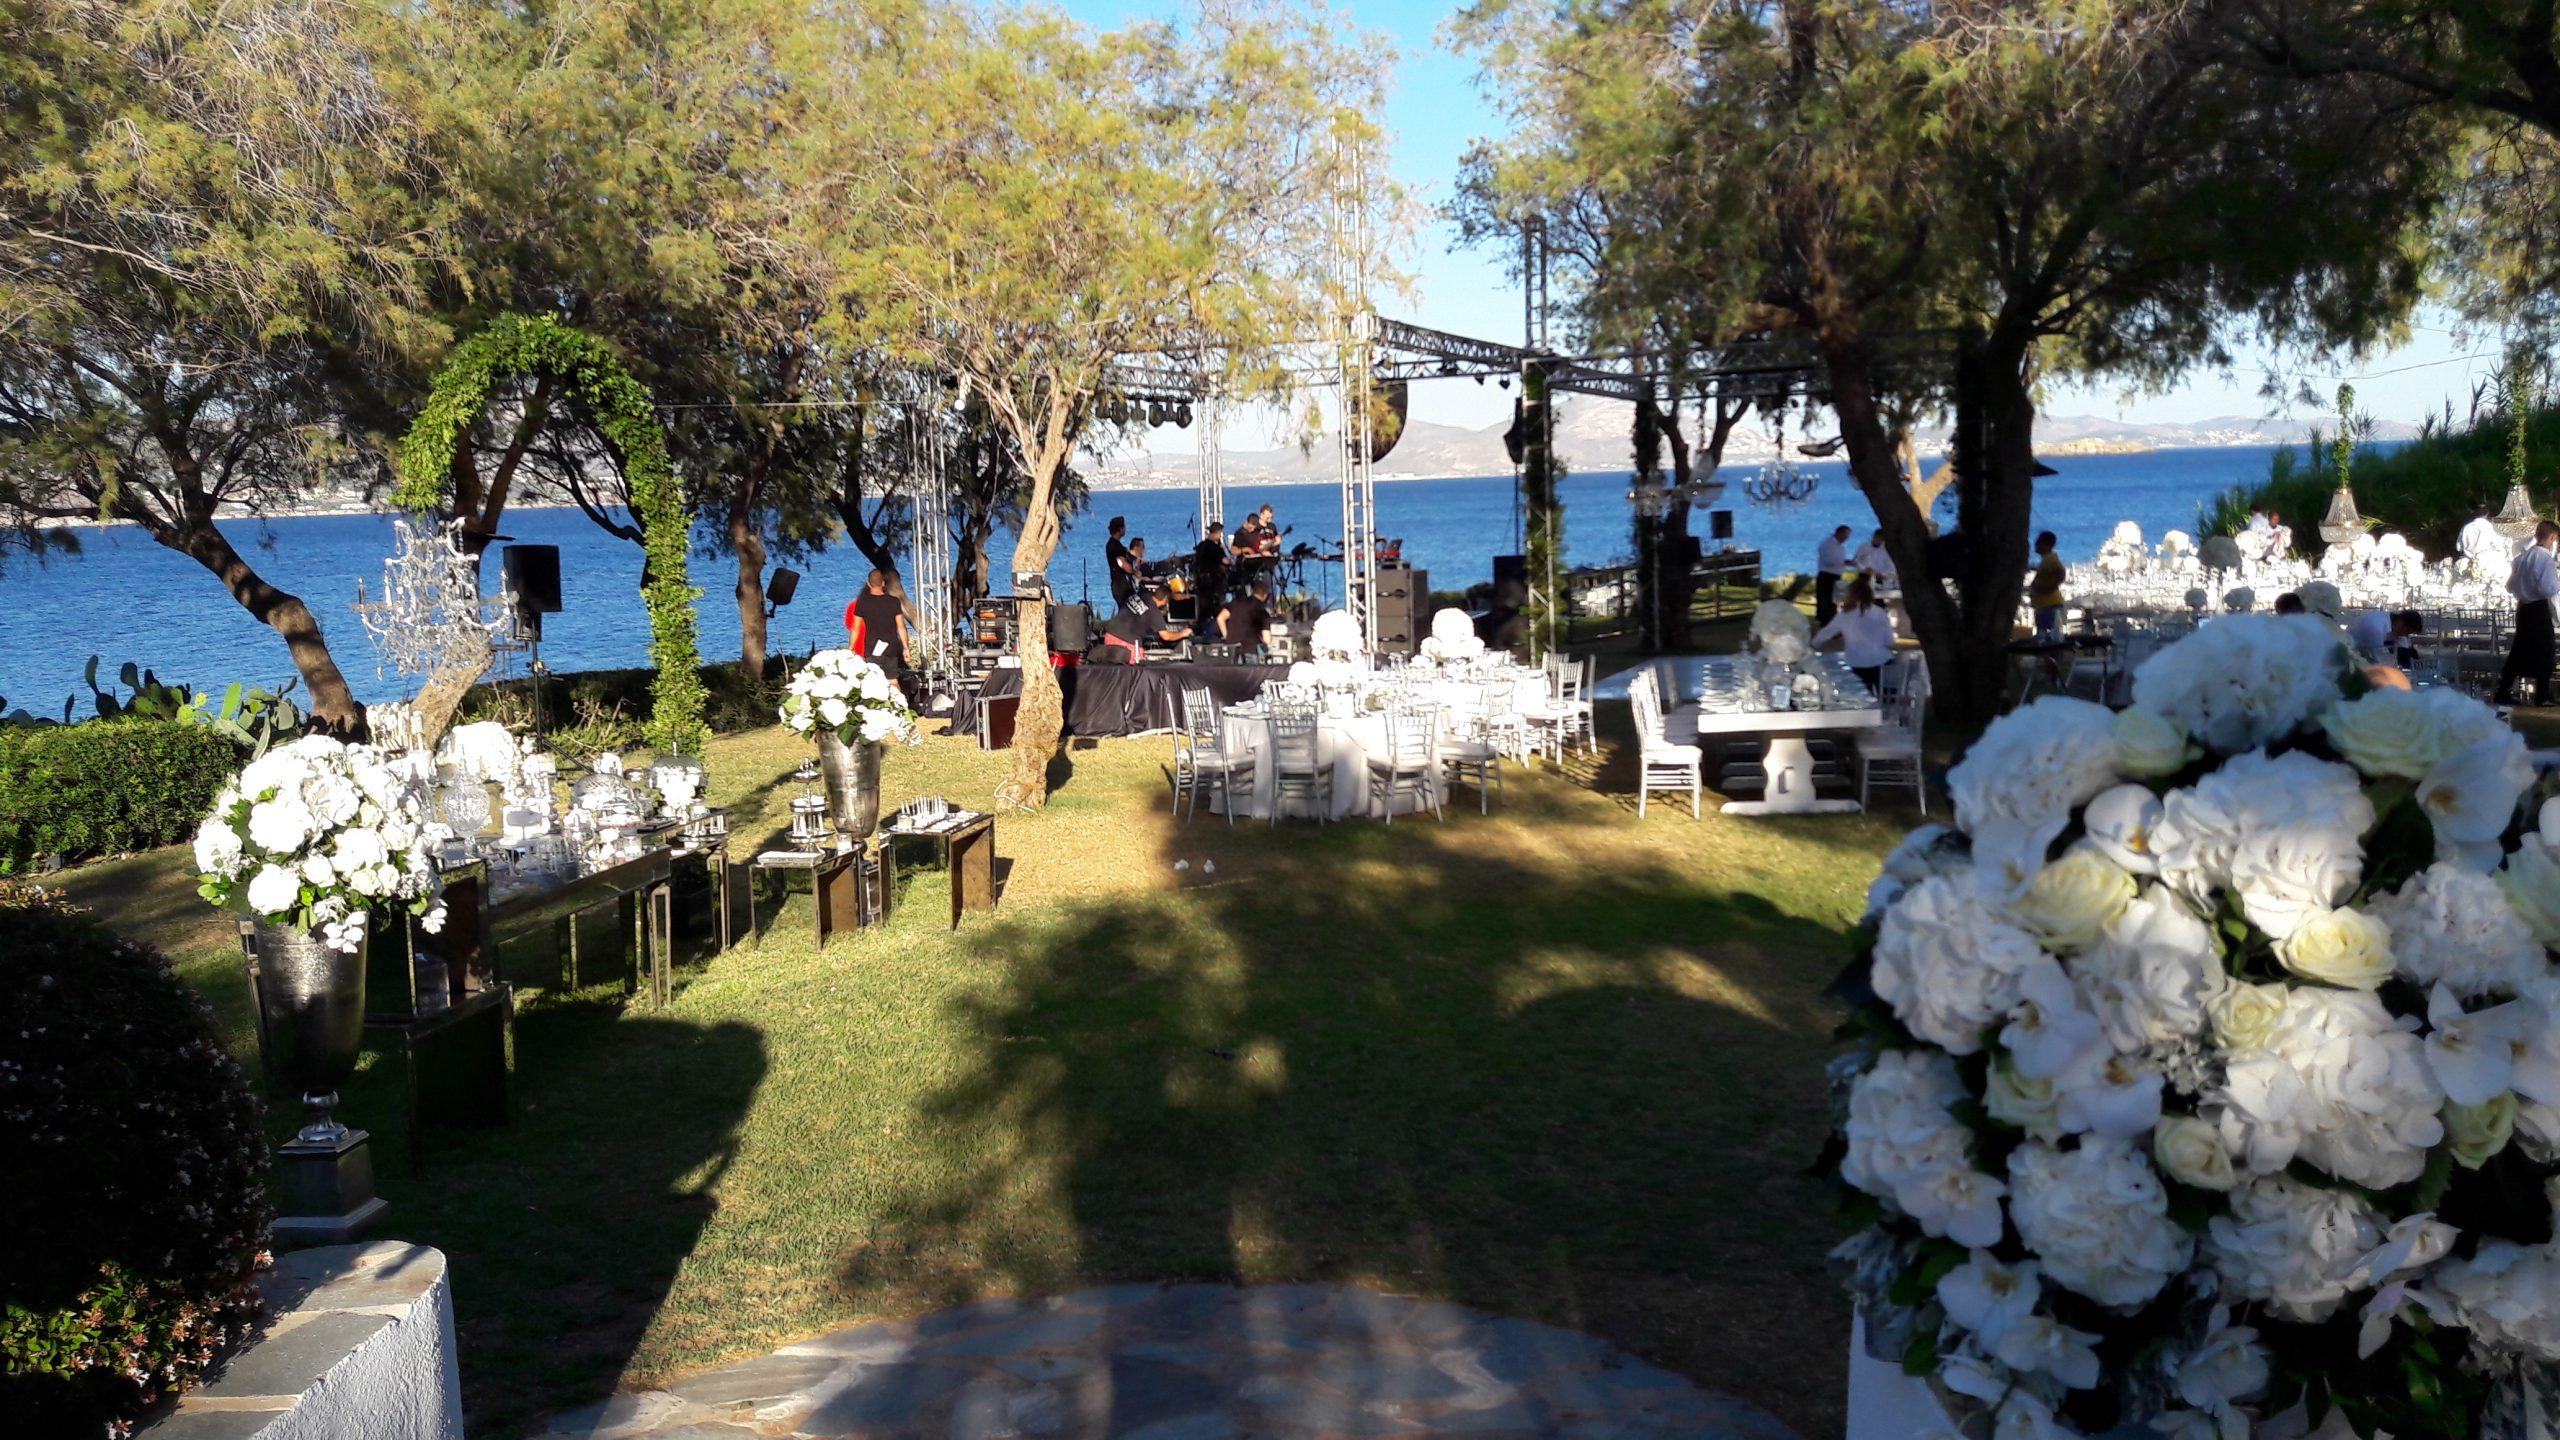 flowers papadakis est 1989 weddings events decorations5